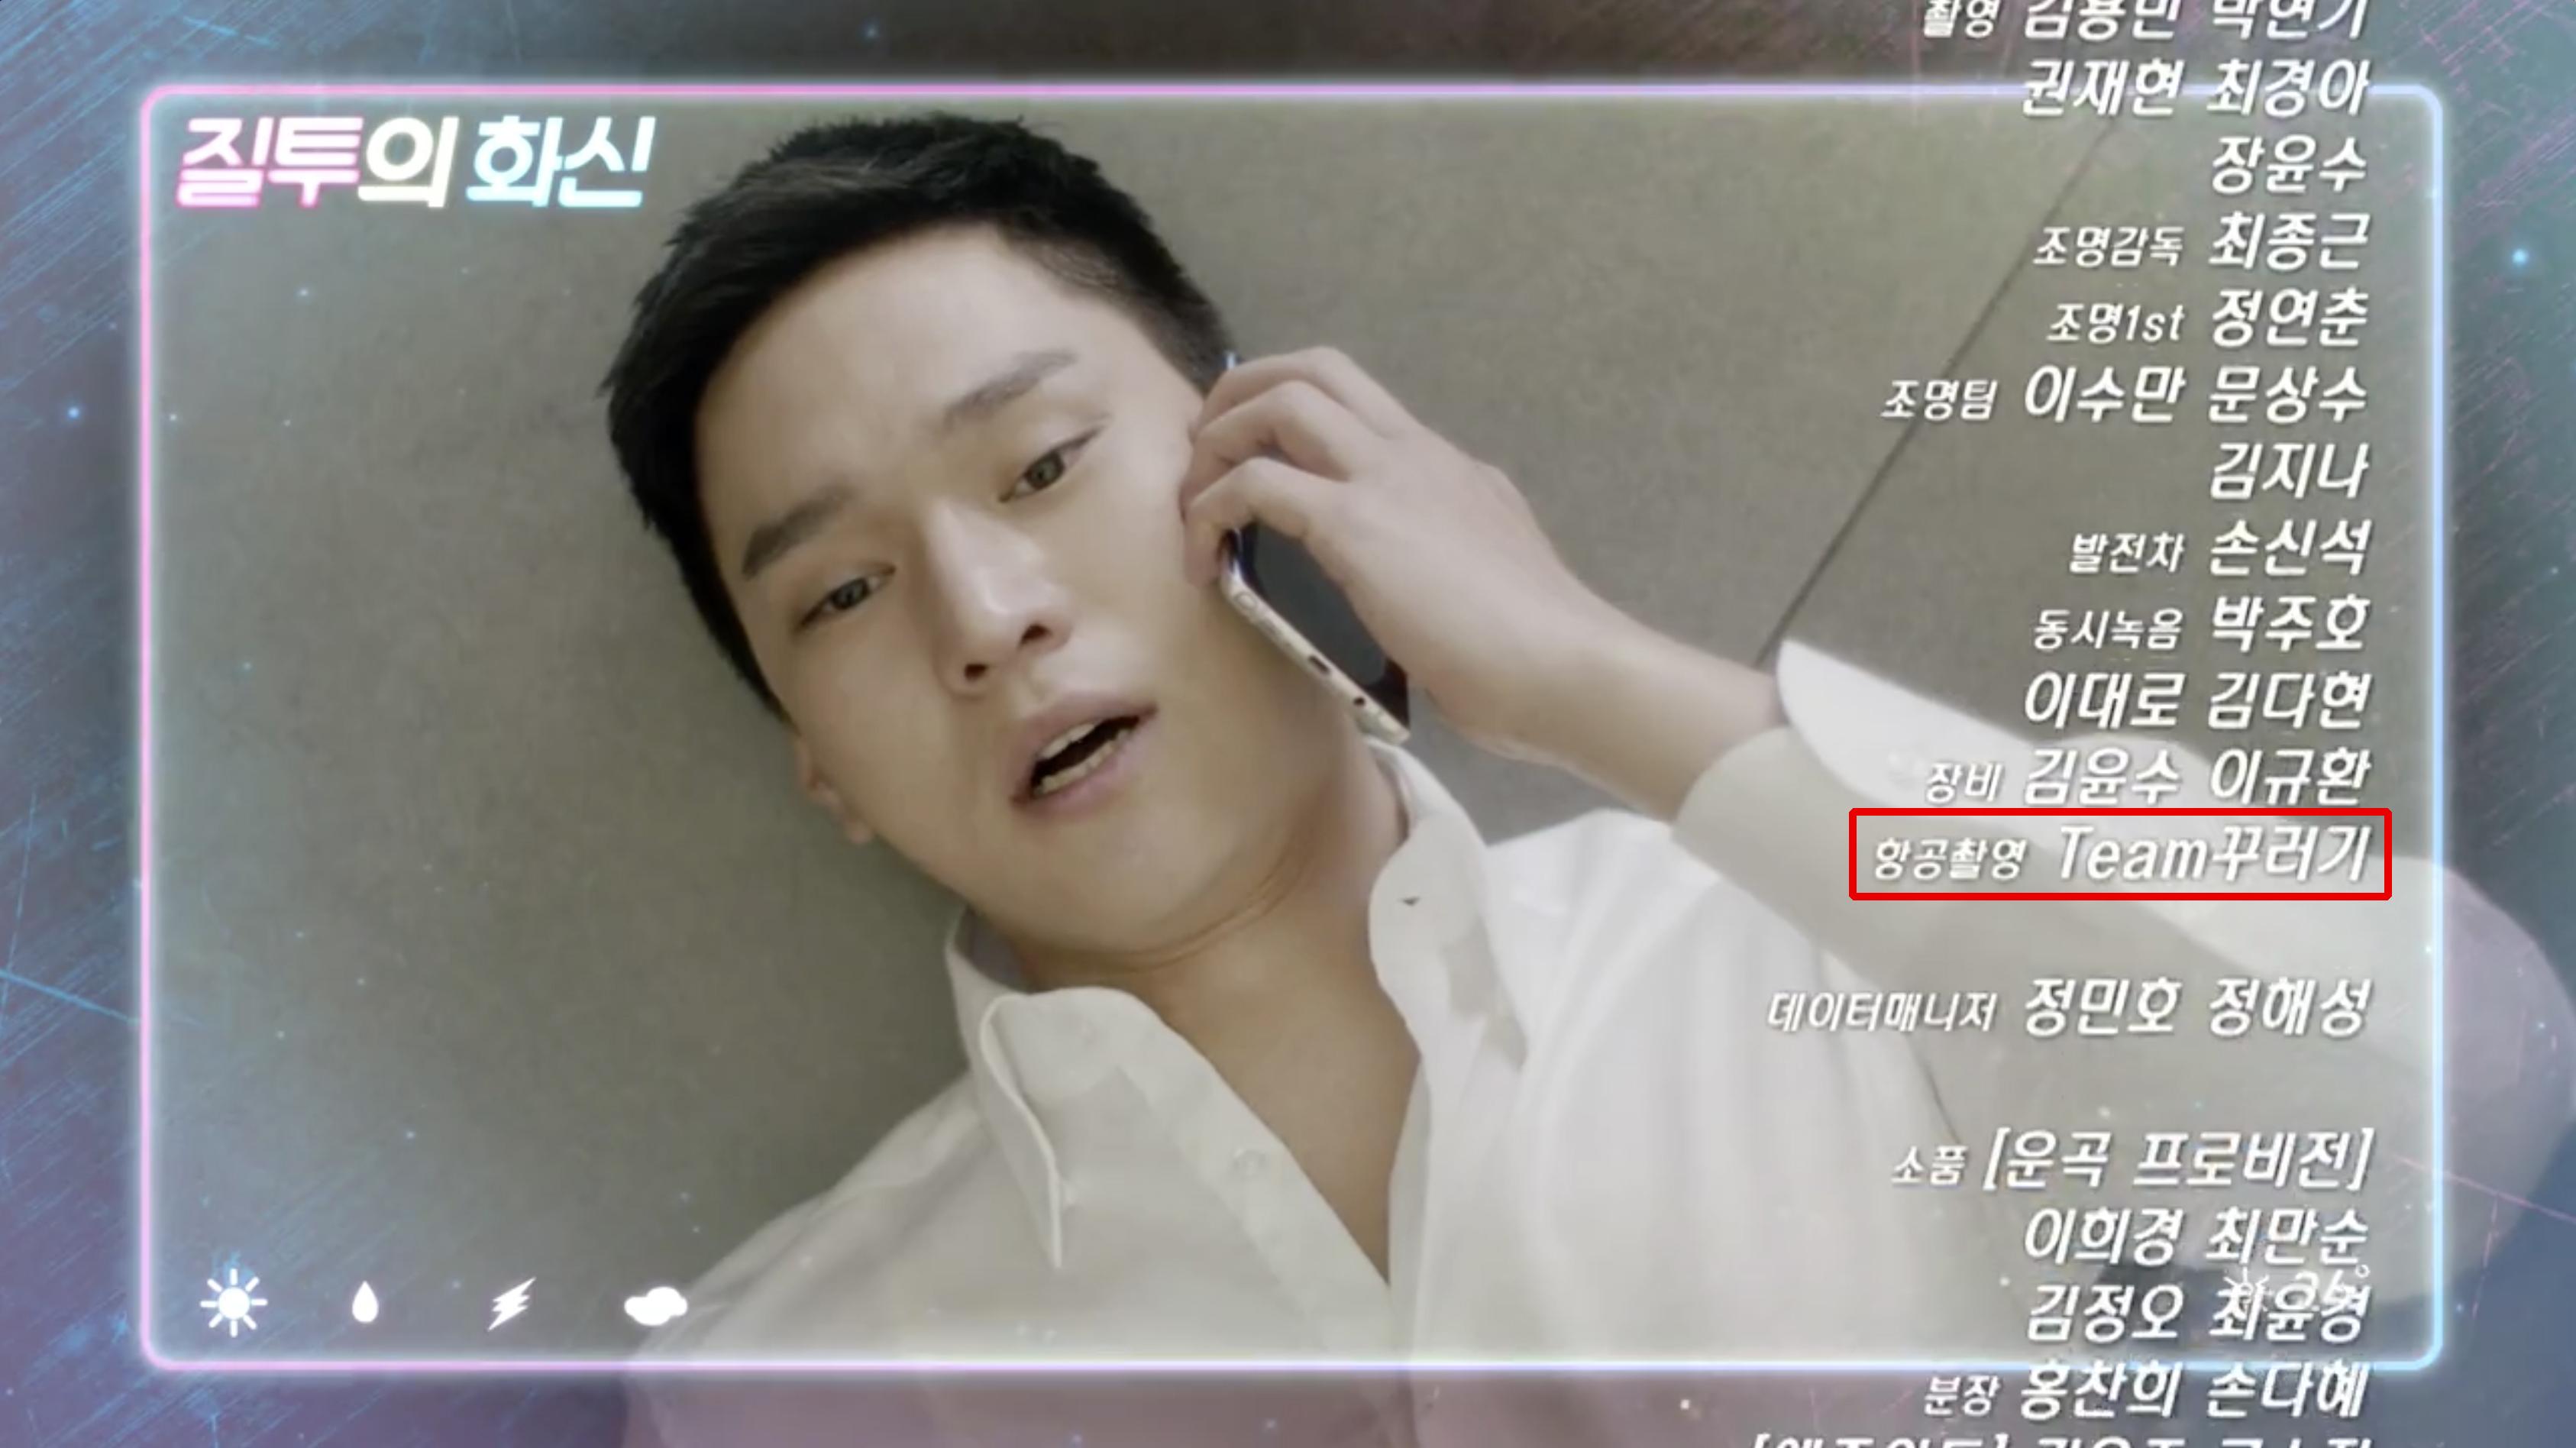 SBS 질투의화신 엔딩크레딧